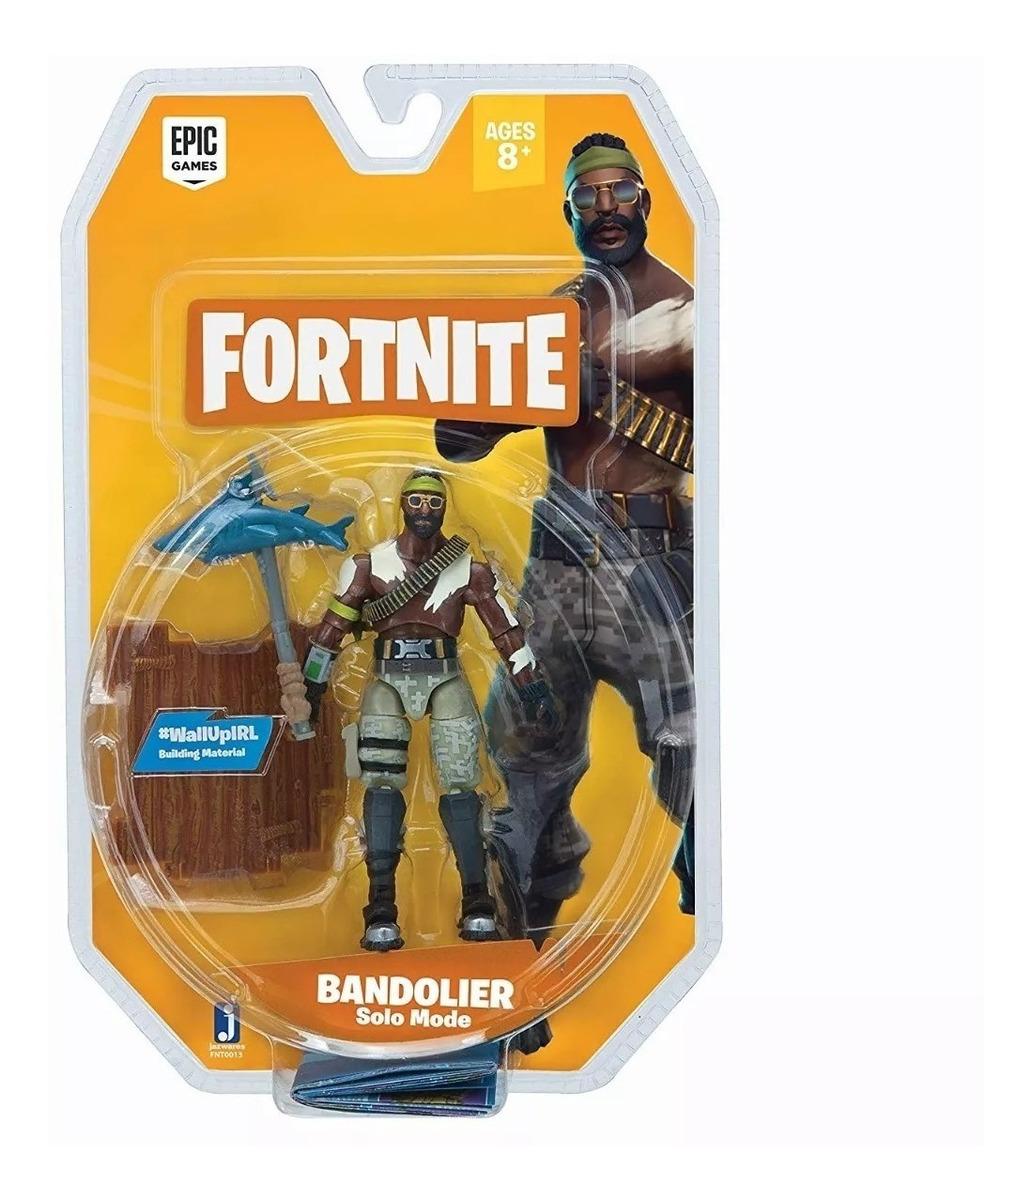 Boneco Fortnite Bandolier Articulado Epic Games Original